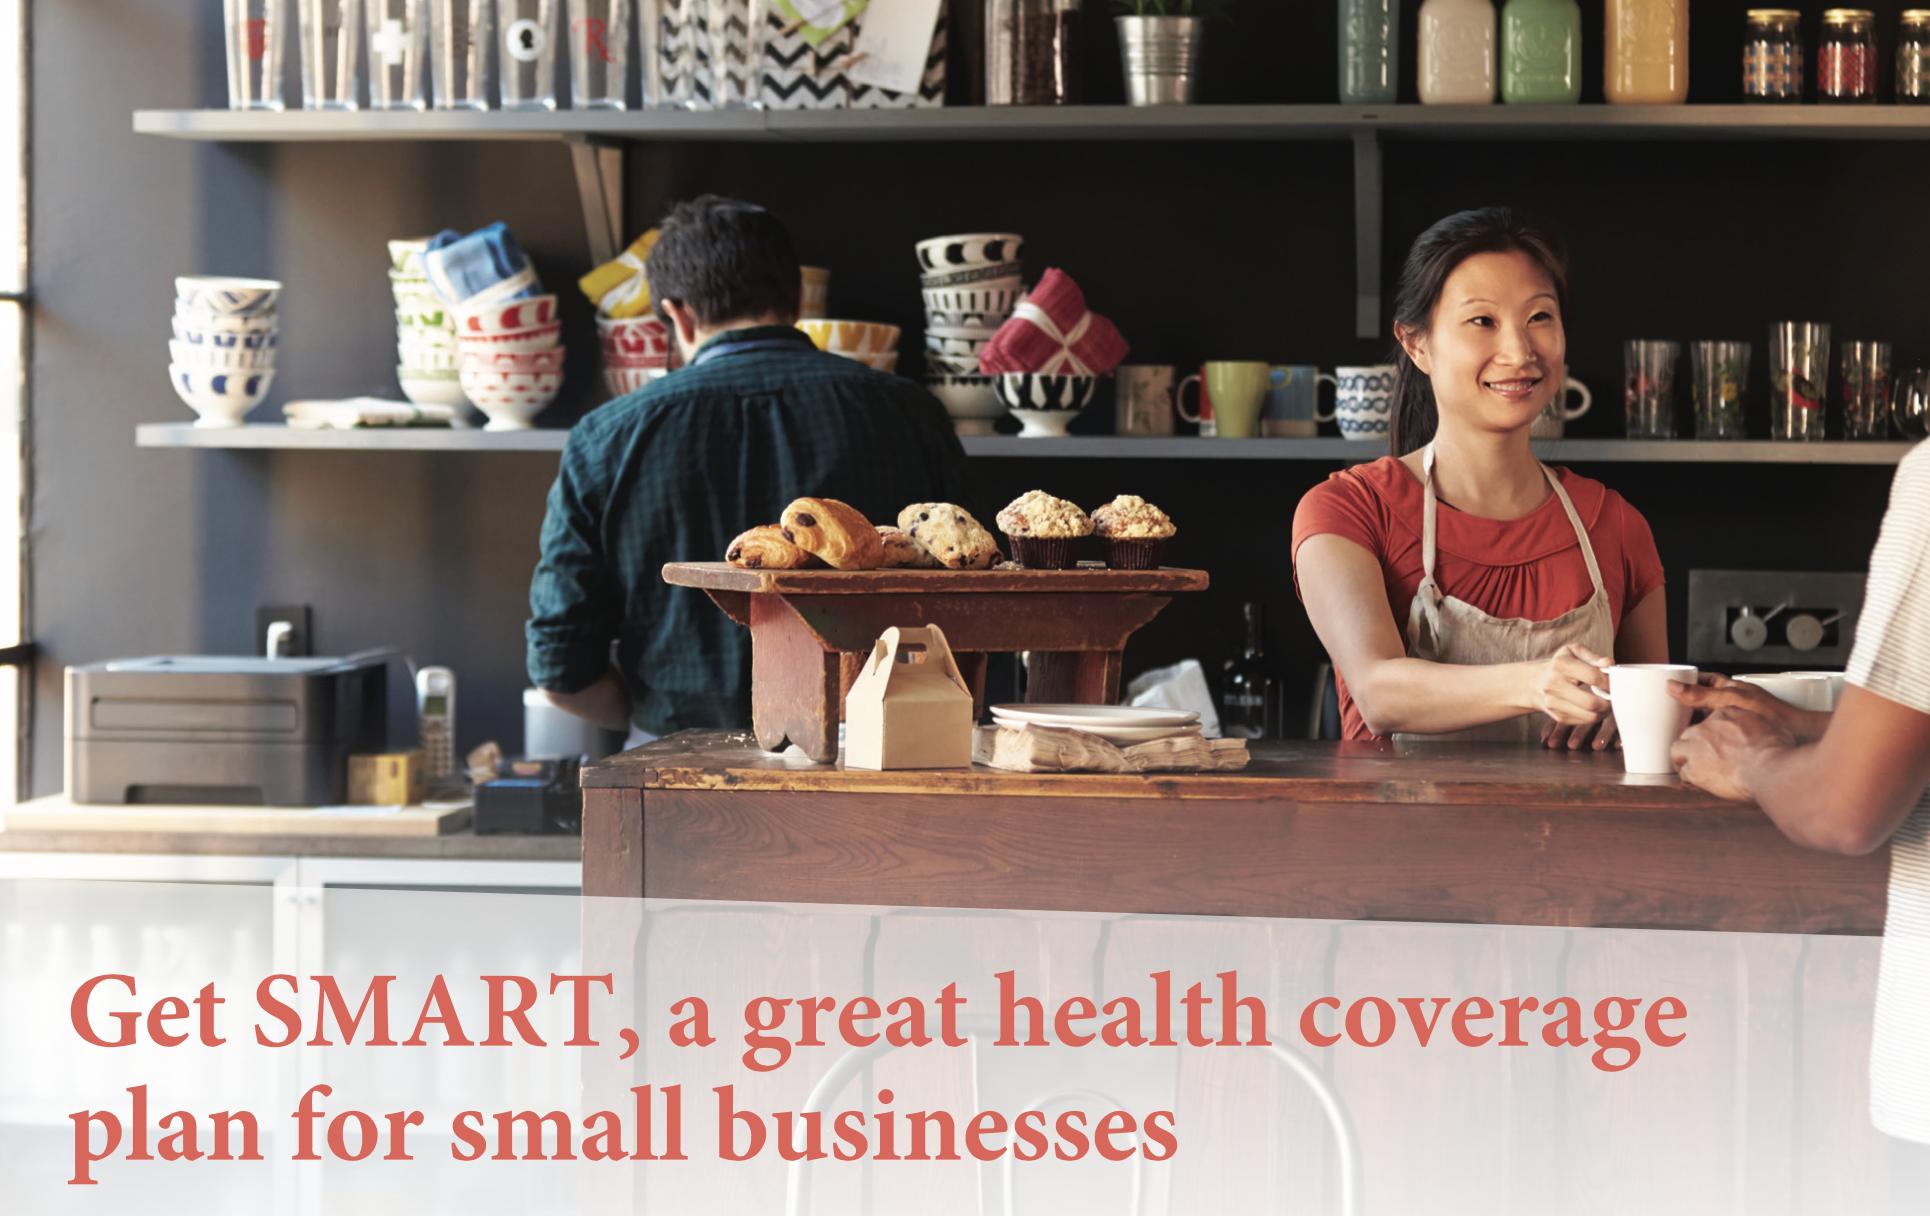 SMART insurance plan